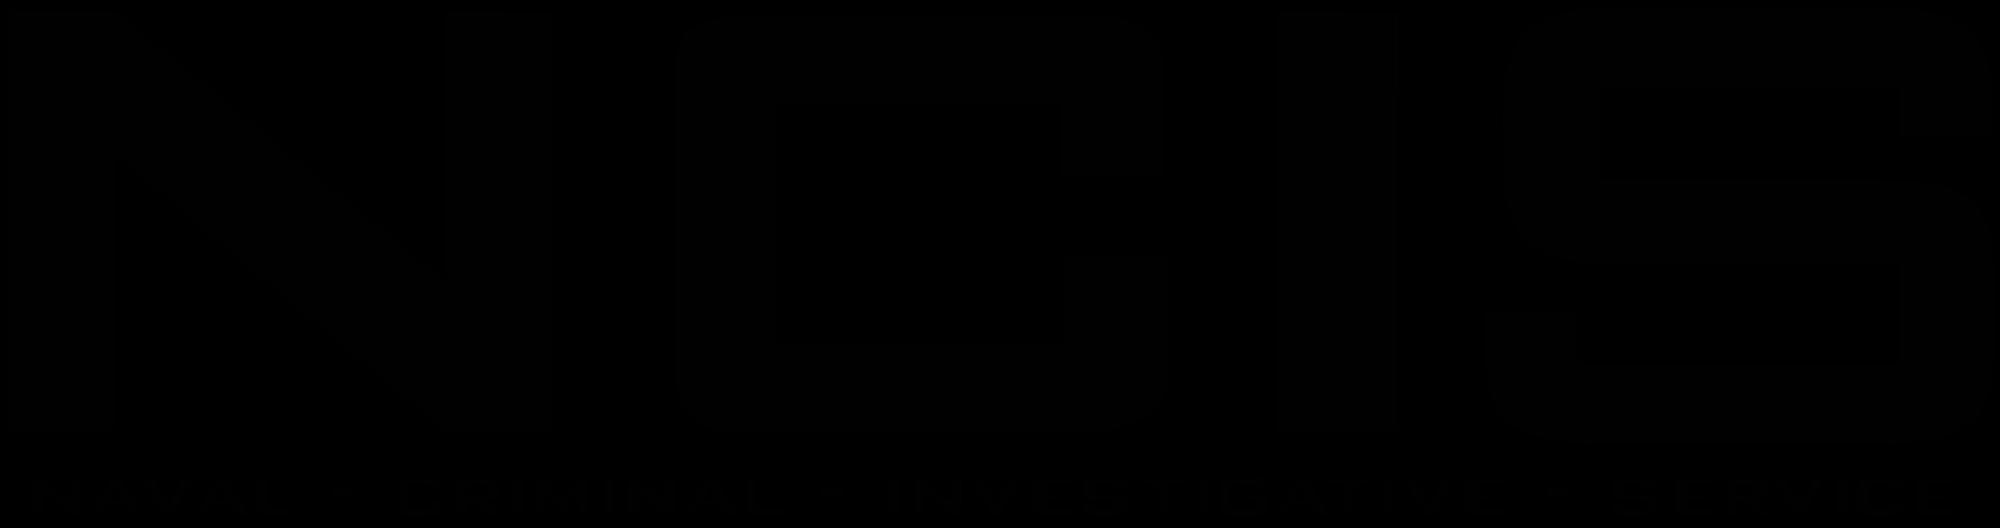 File ncis series svg. Square clipart tv logo